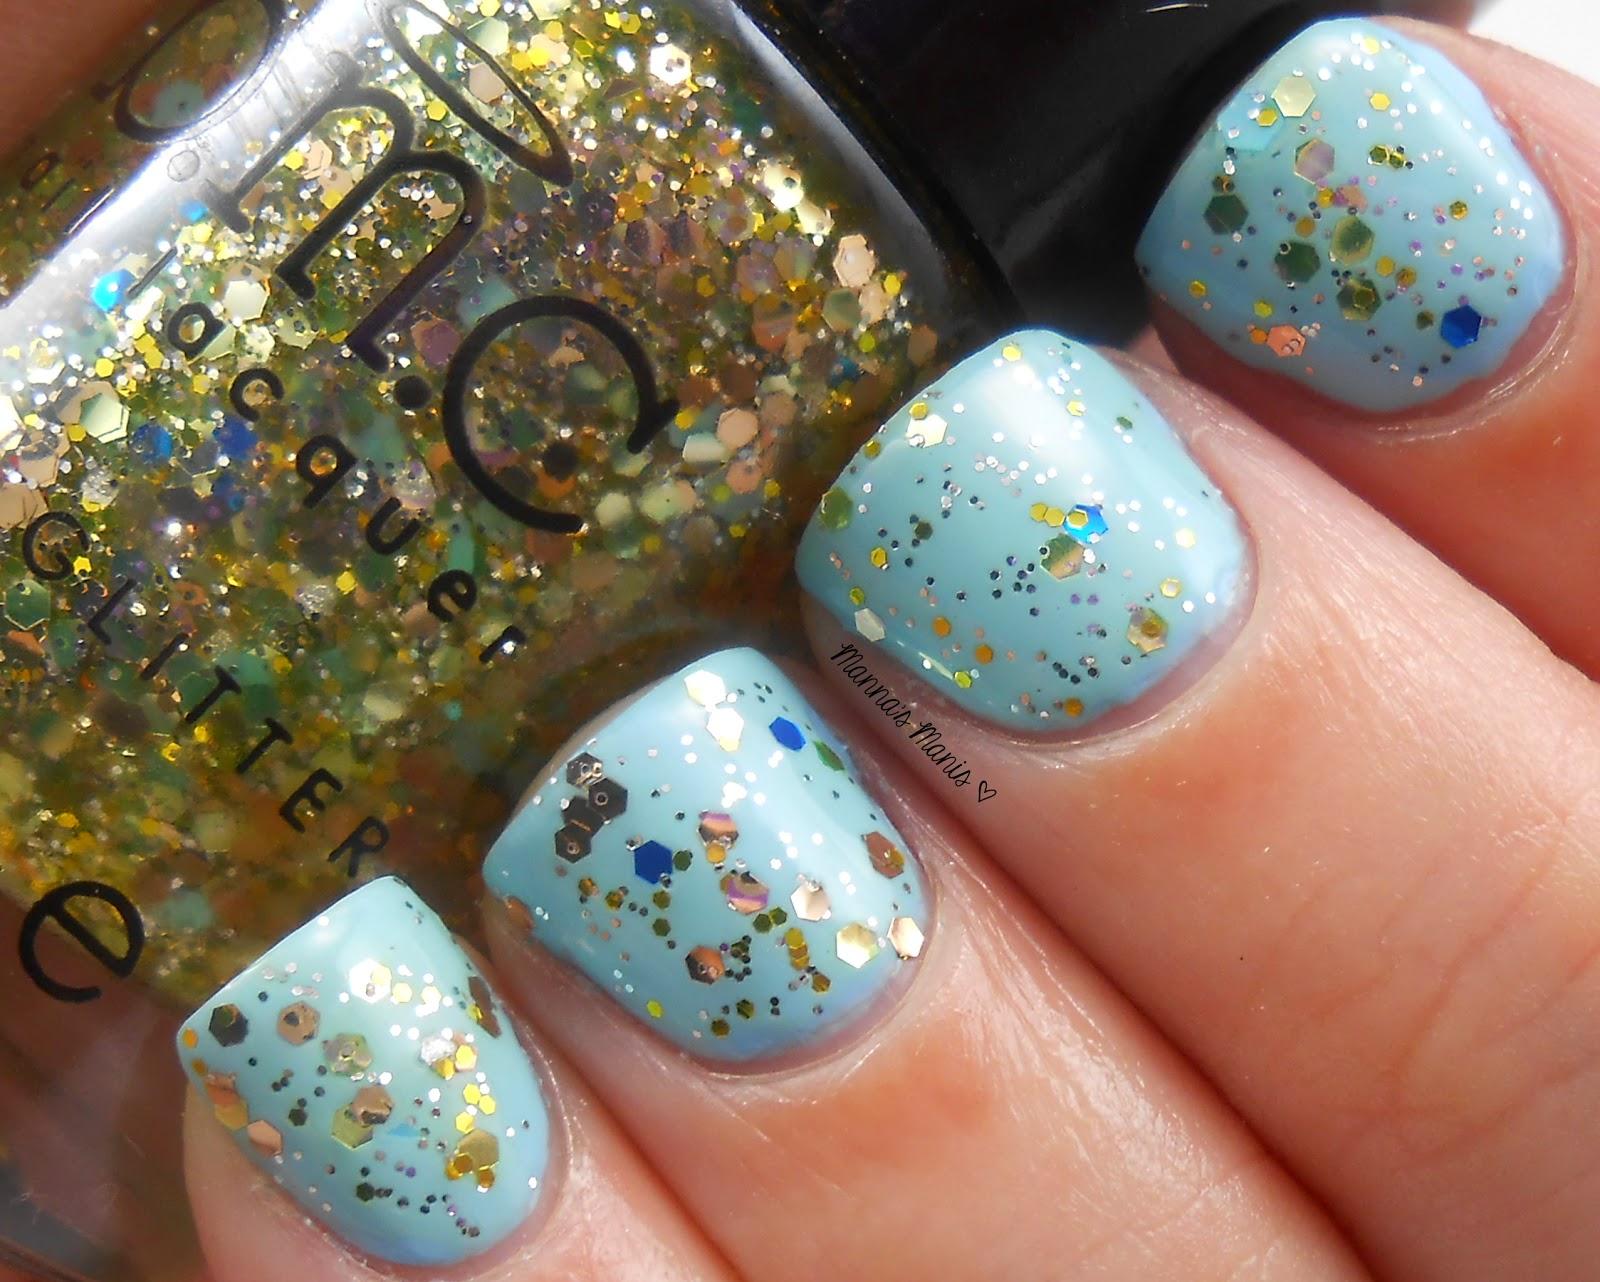 BMC i bleed glitter, a gold and blue glitter nail polish